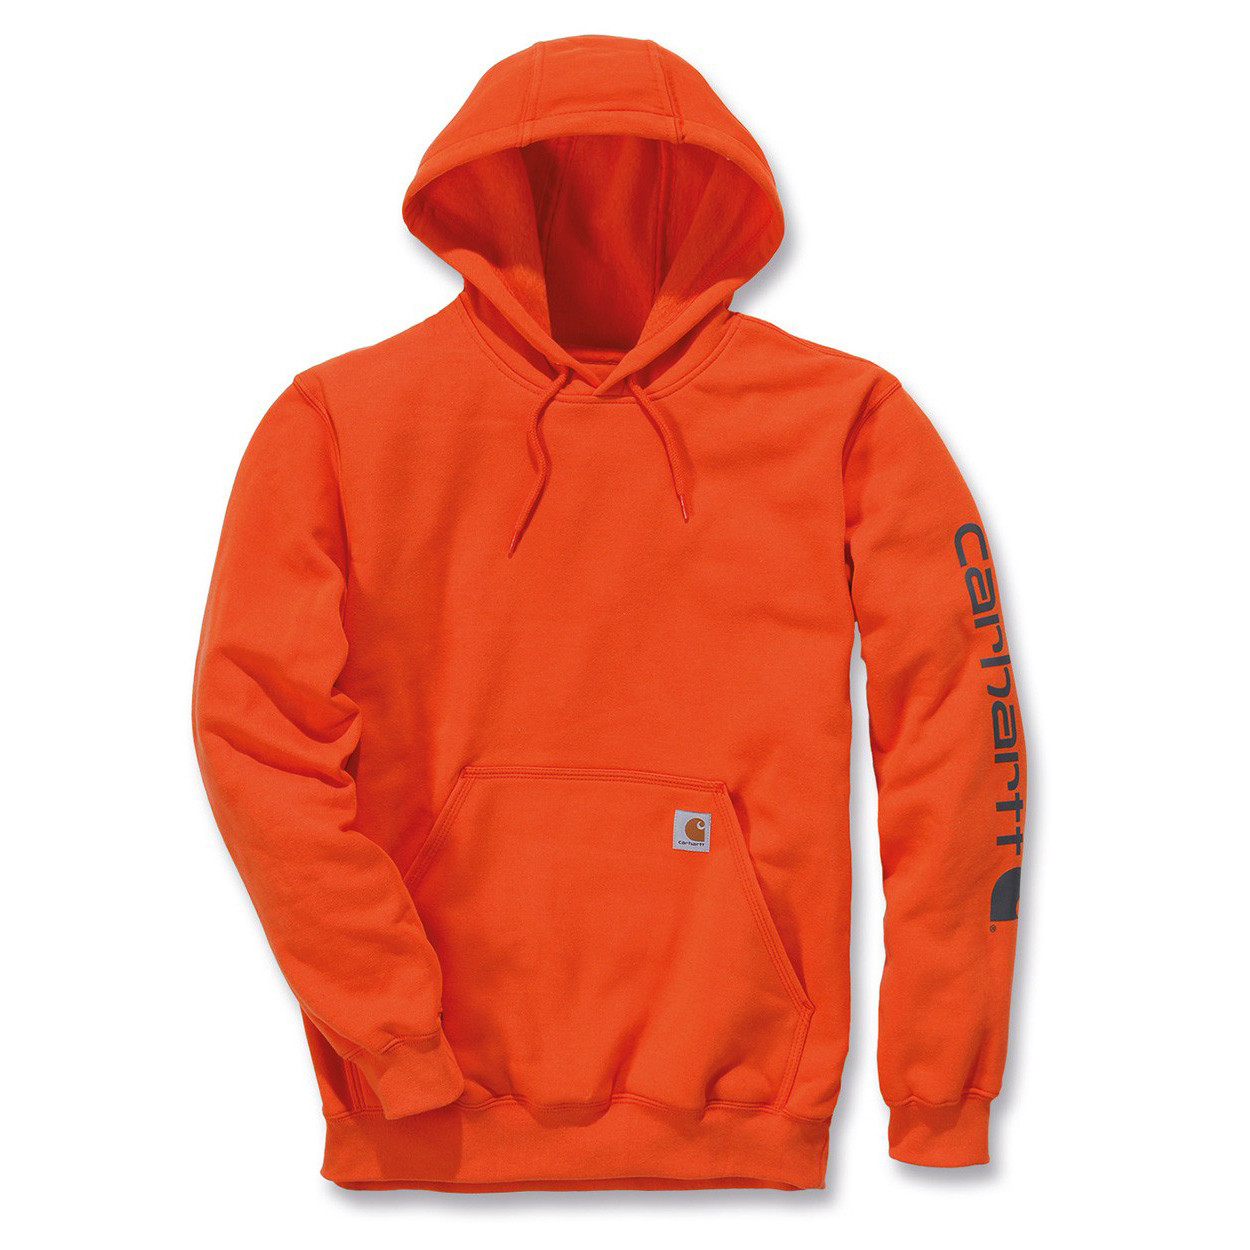 Худи Carhartt Sleeve Logo Hooded Sweatshirt K288 (Orange)